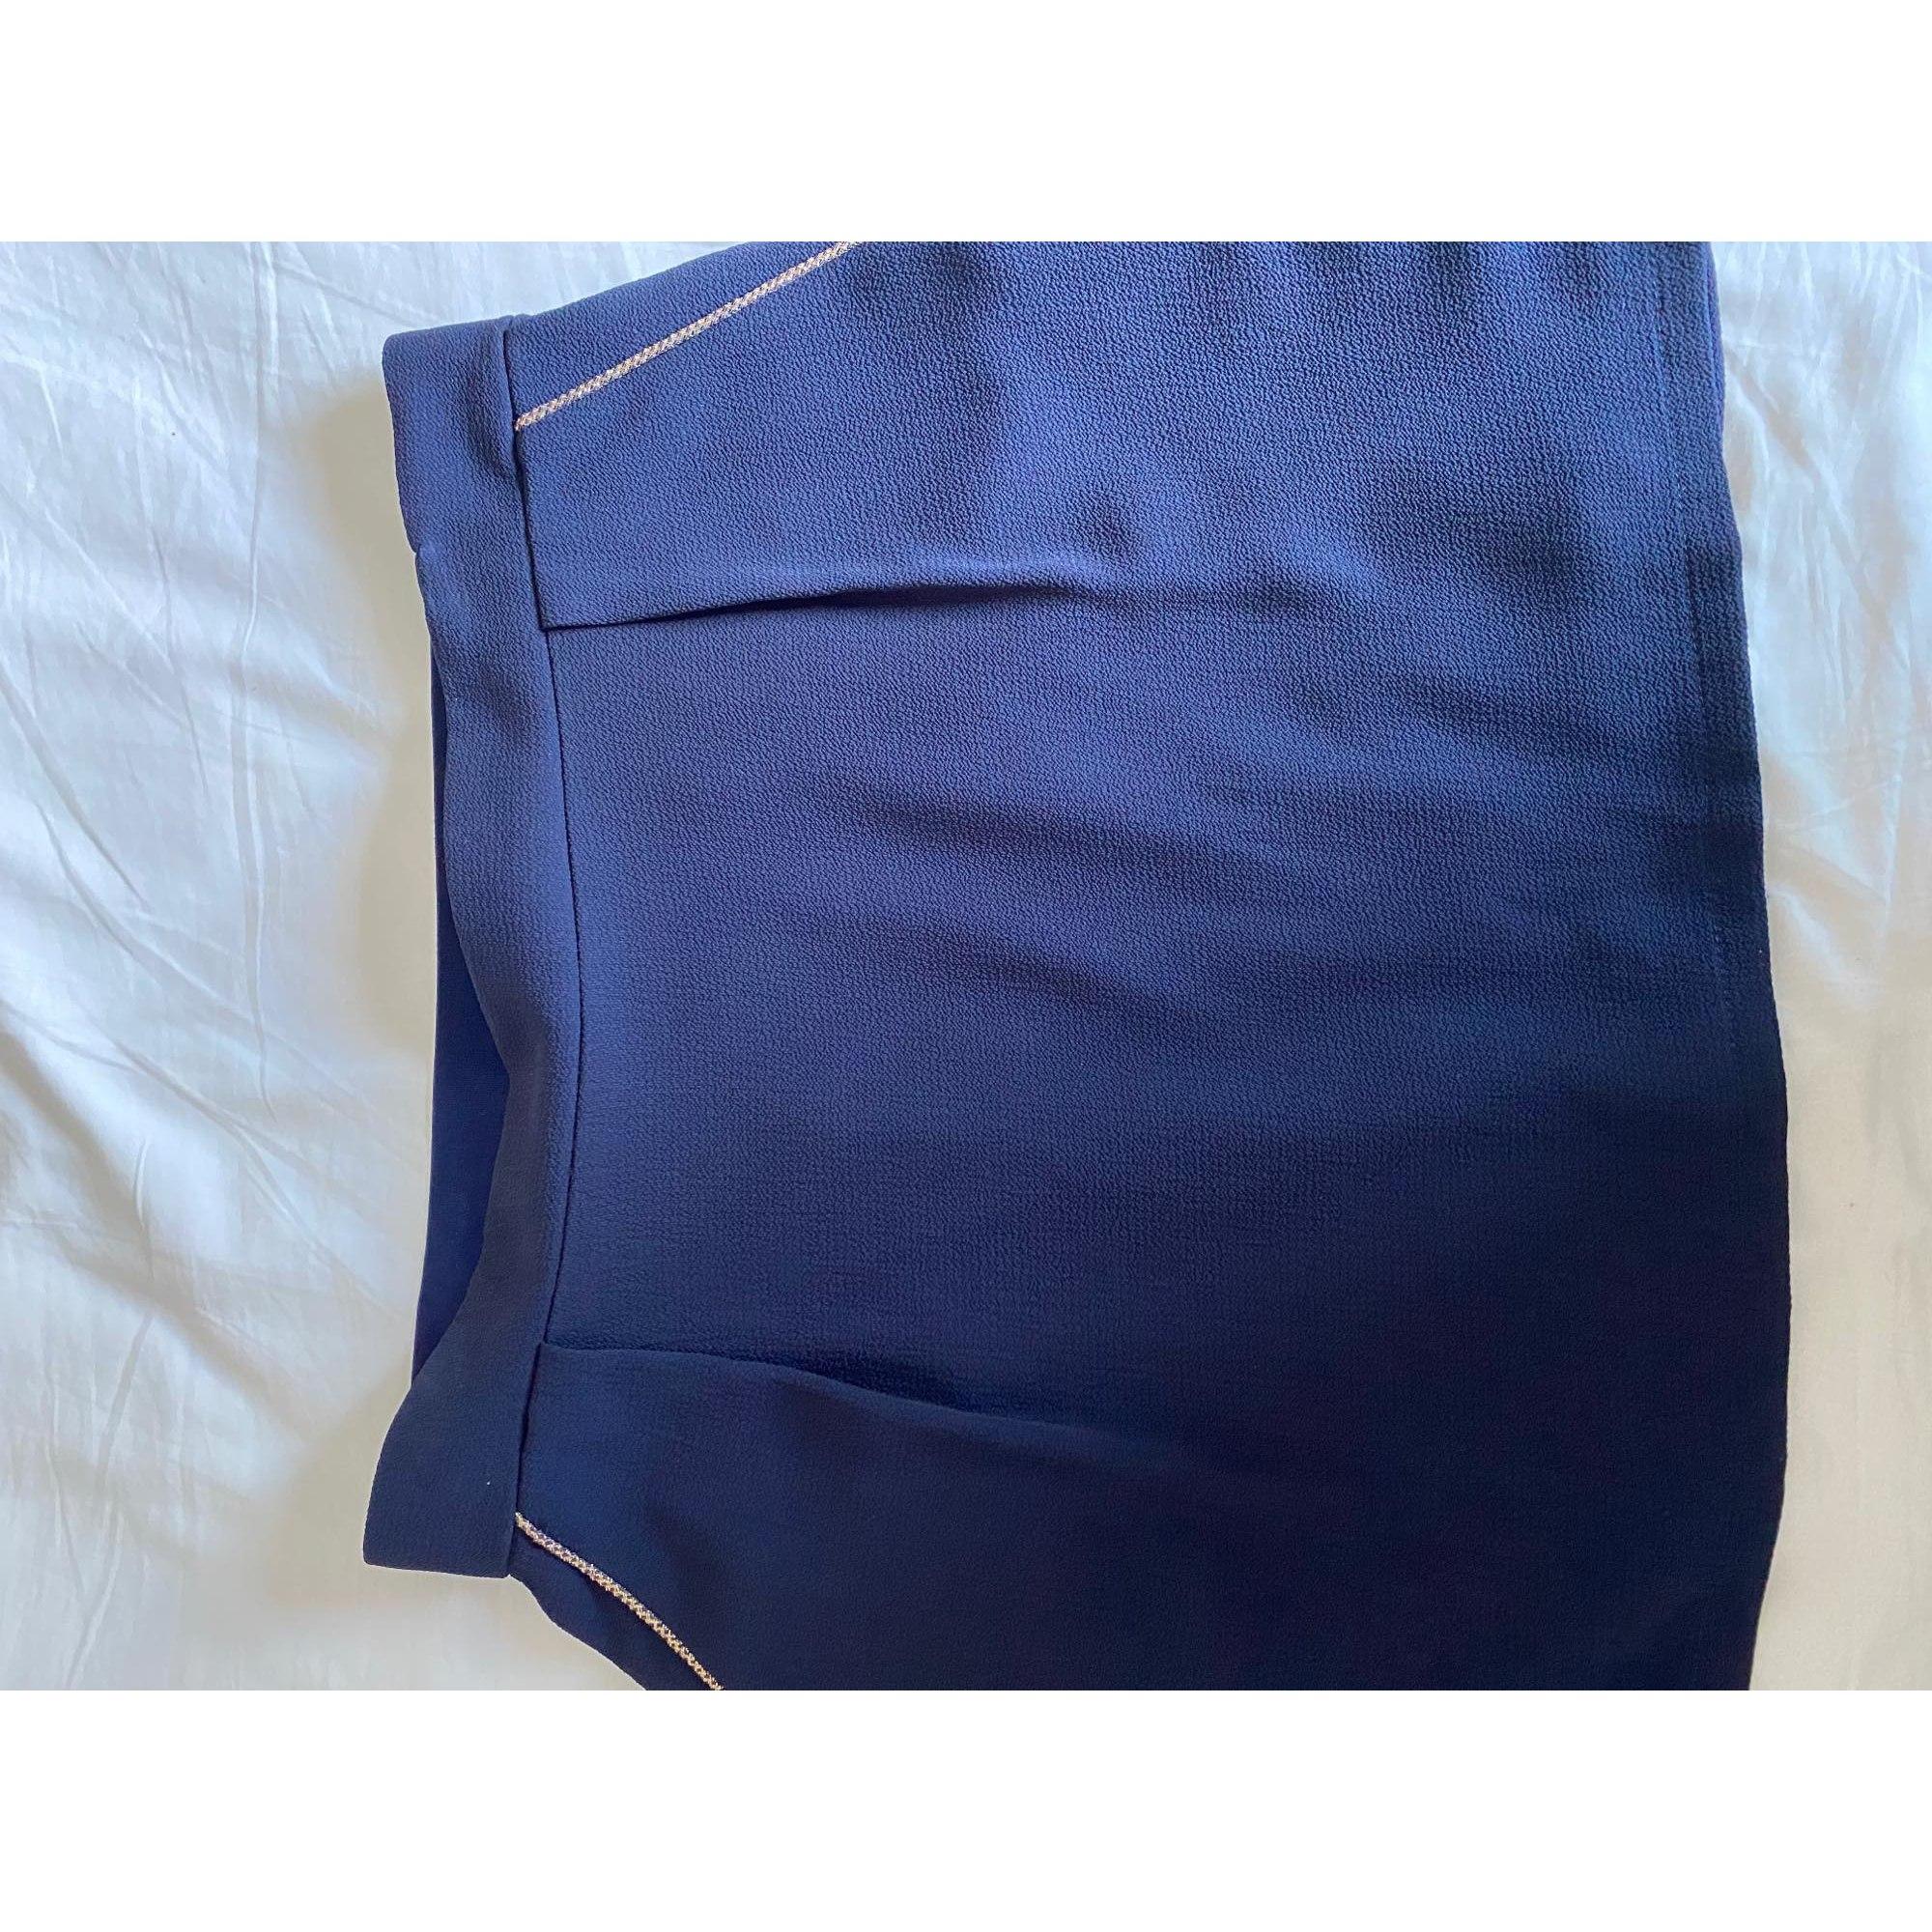 Jupe courte MAMOUCHKA Bleu, bleu marine, bleu turquoise